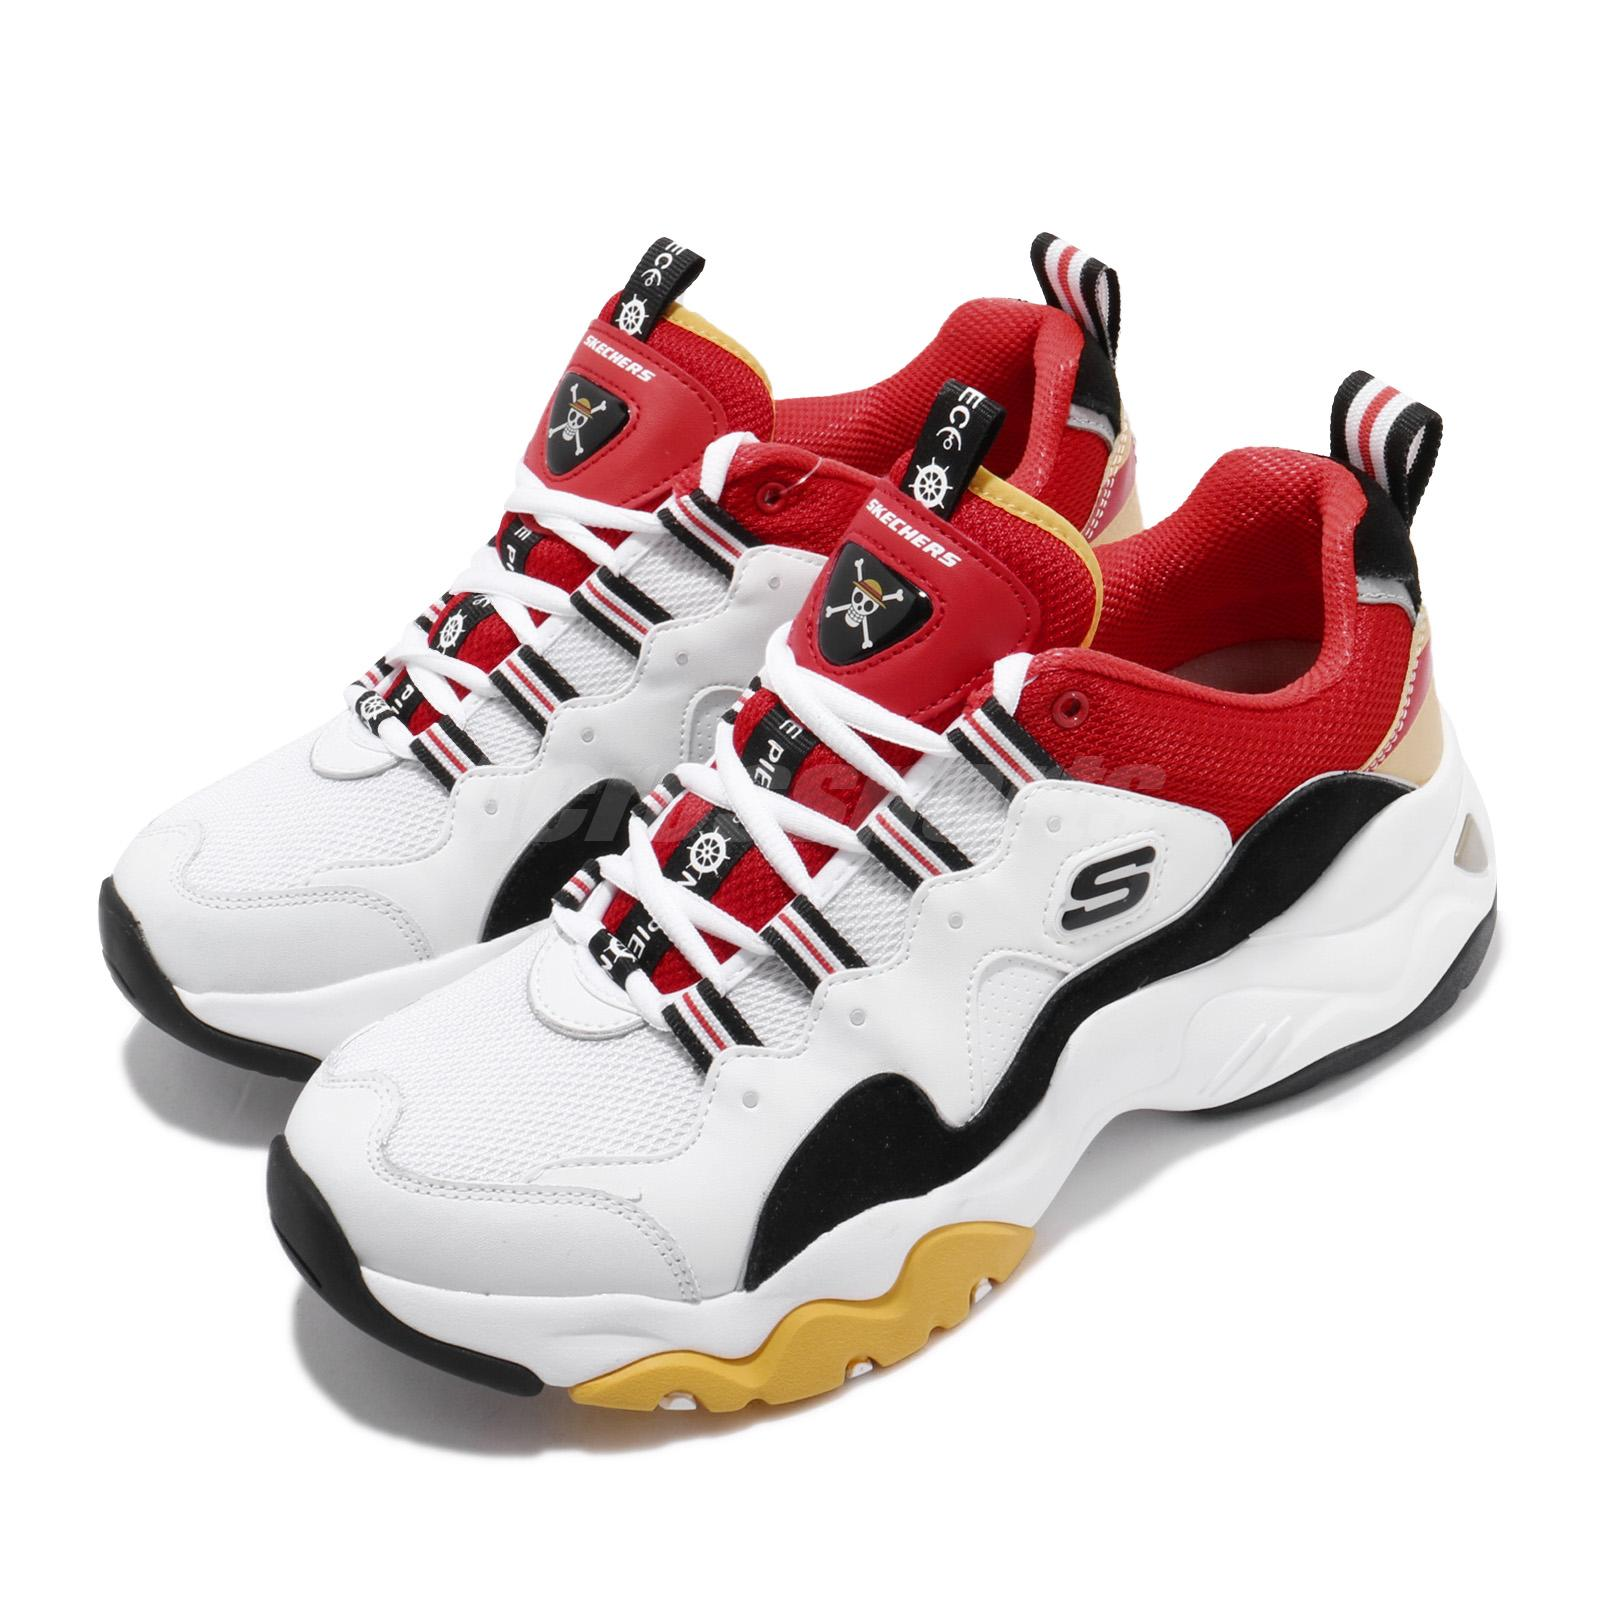 About Piece 0 Details DLuffy Skechers Monkey Wrdb 3 999112 Shoes Red Men One D Lites White q5jL43AR